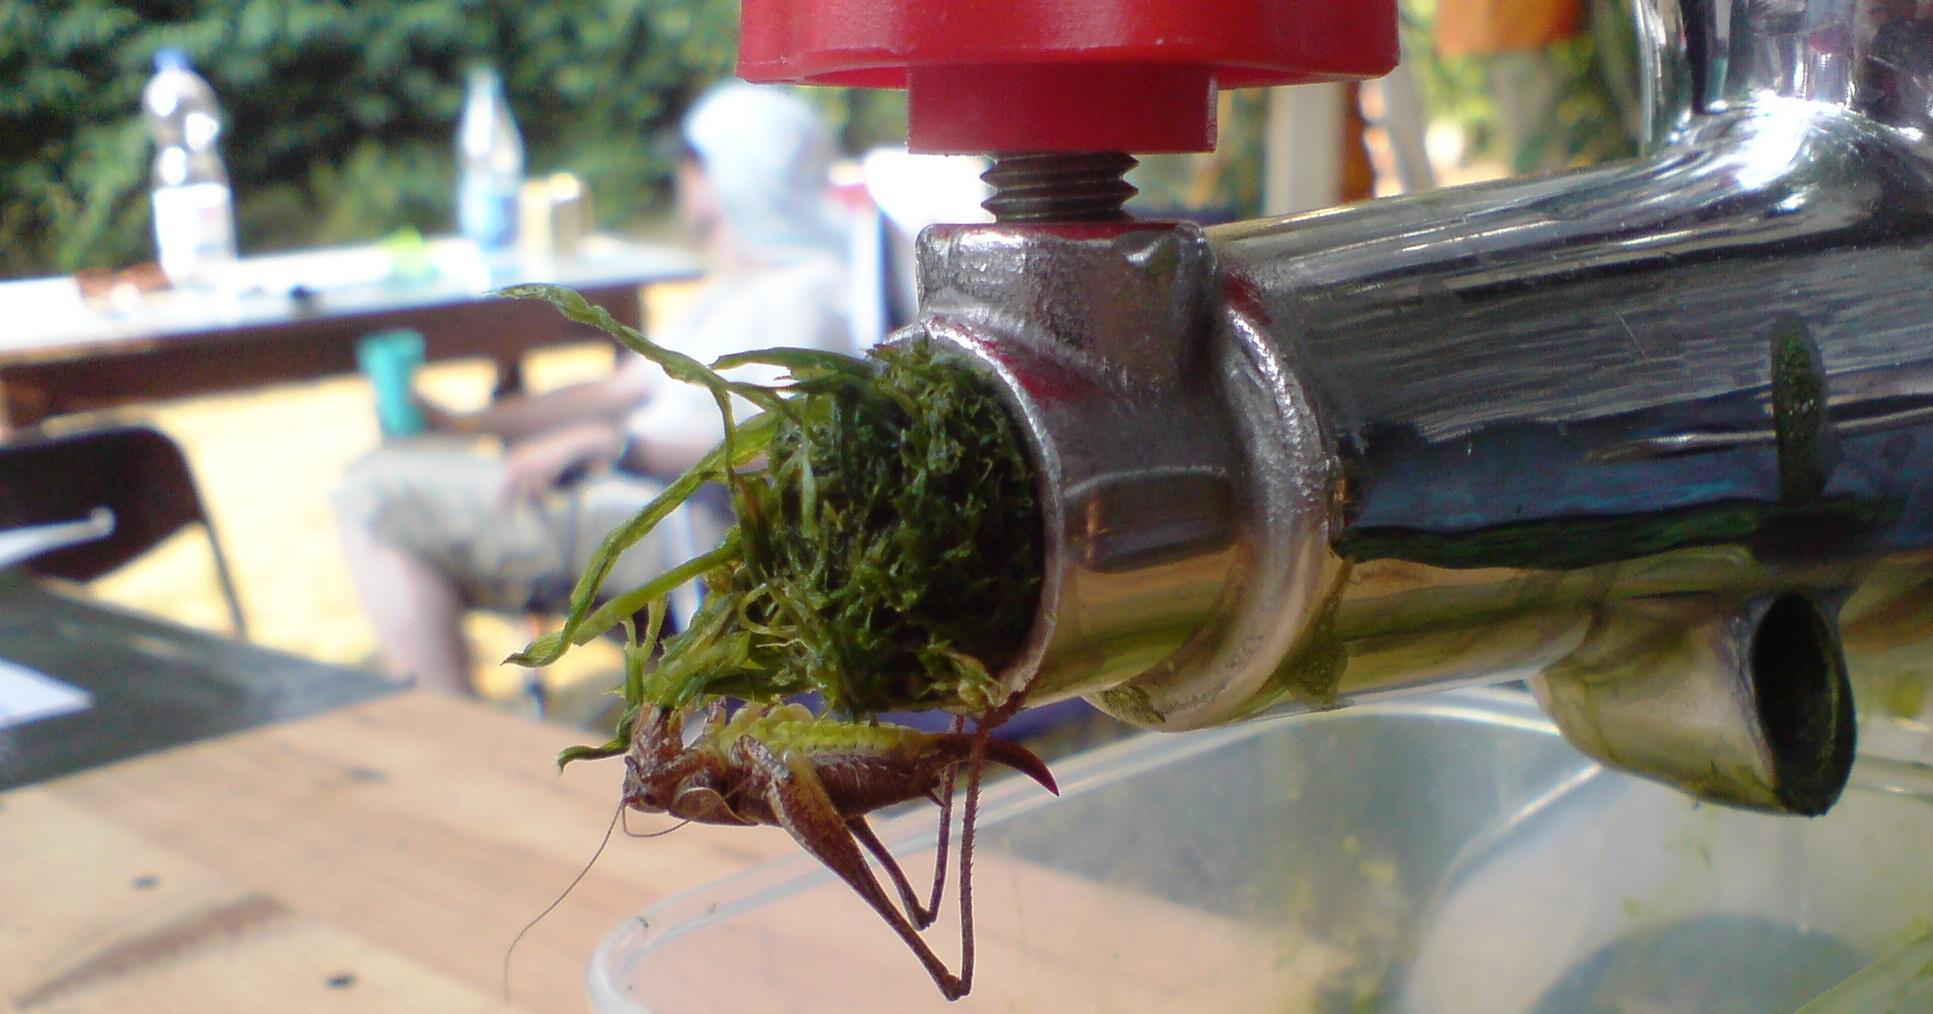 Weizengras-Chlorophylgehalt